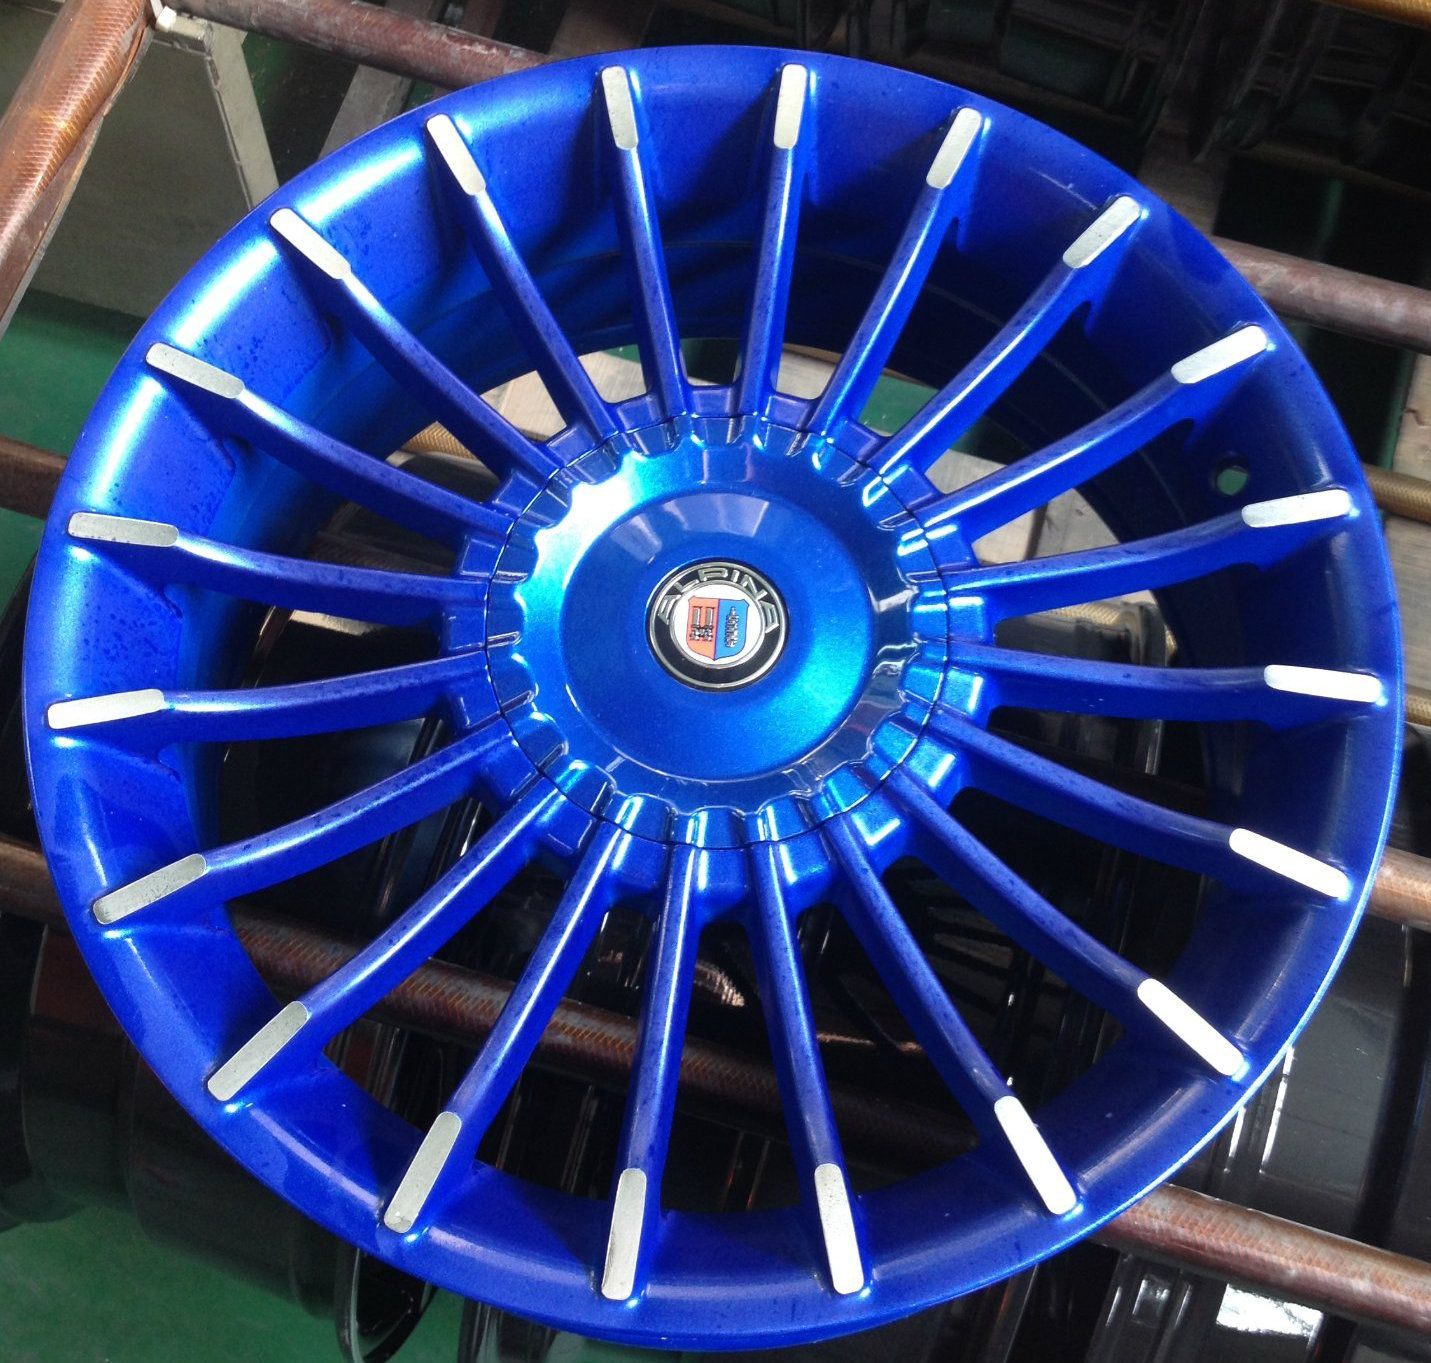 15 16 17 Inch Alpina Alloy Wheel In 2020 Alloy Wheel Alloy Wheels Repair Toyota Rims